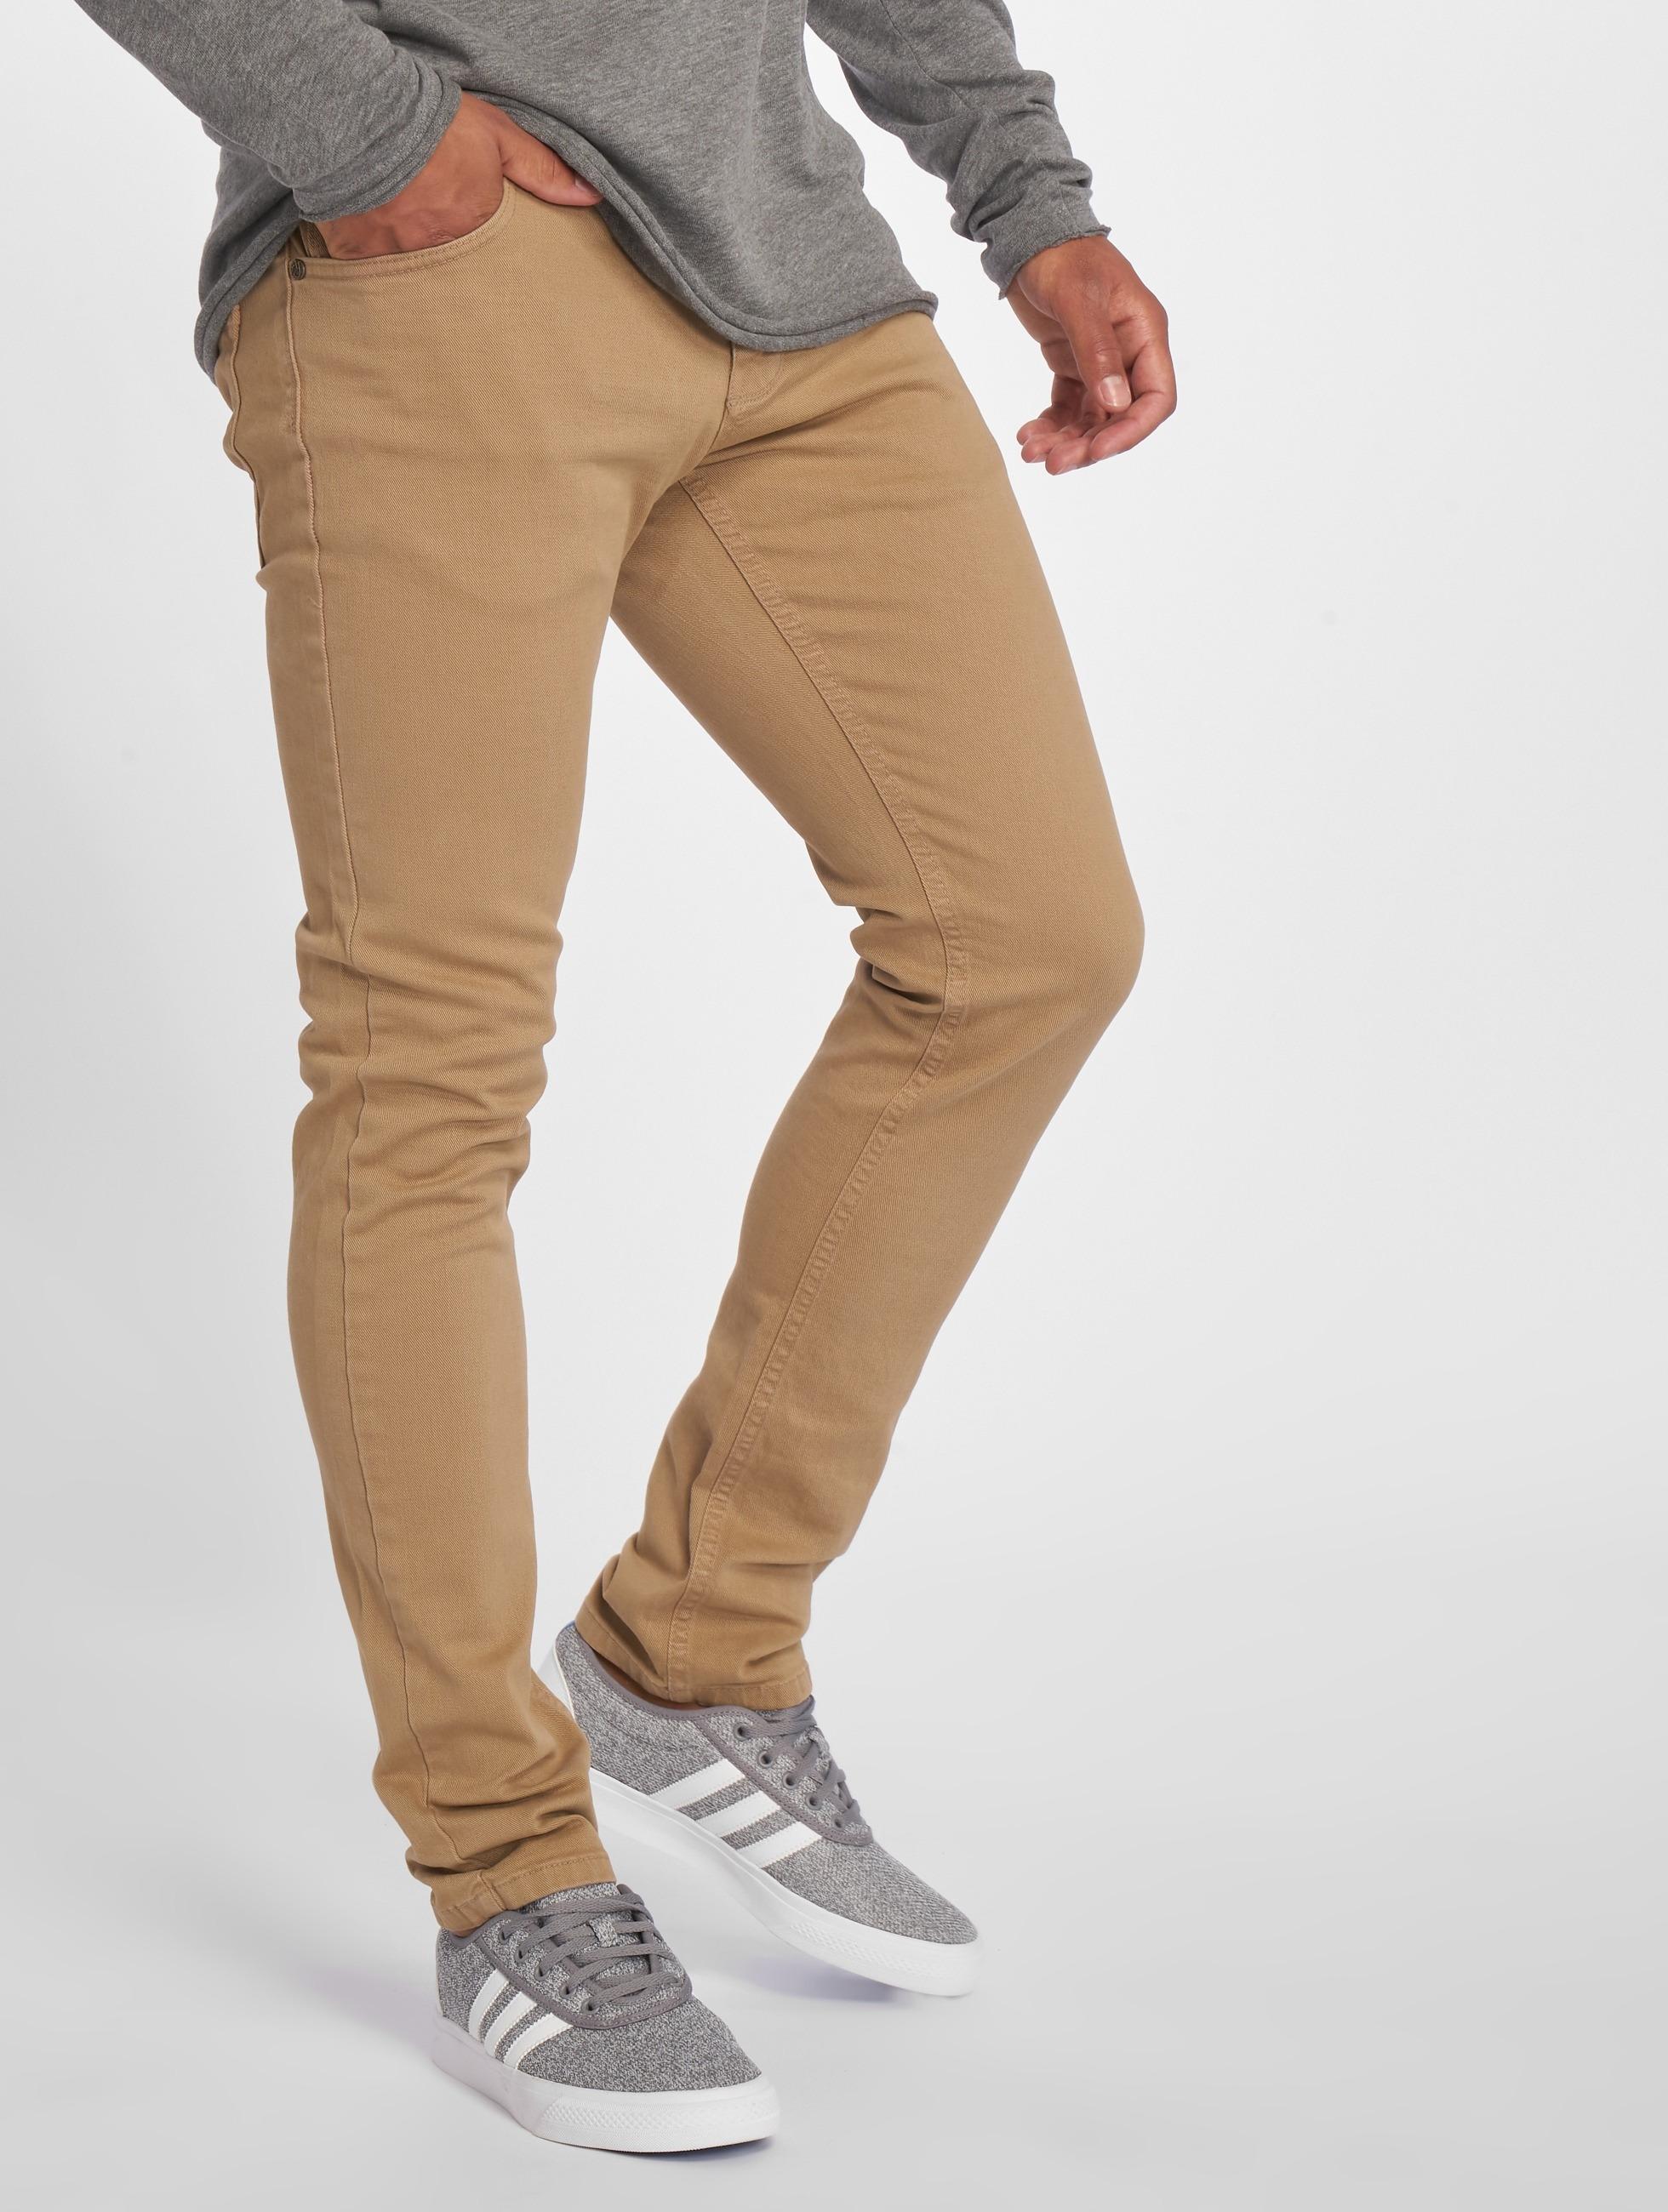 2Y / Slim Fit Jeans ClassicoDark in beige W 32